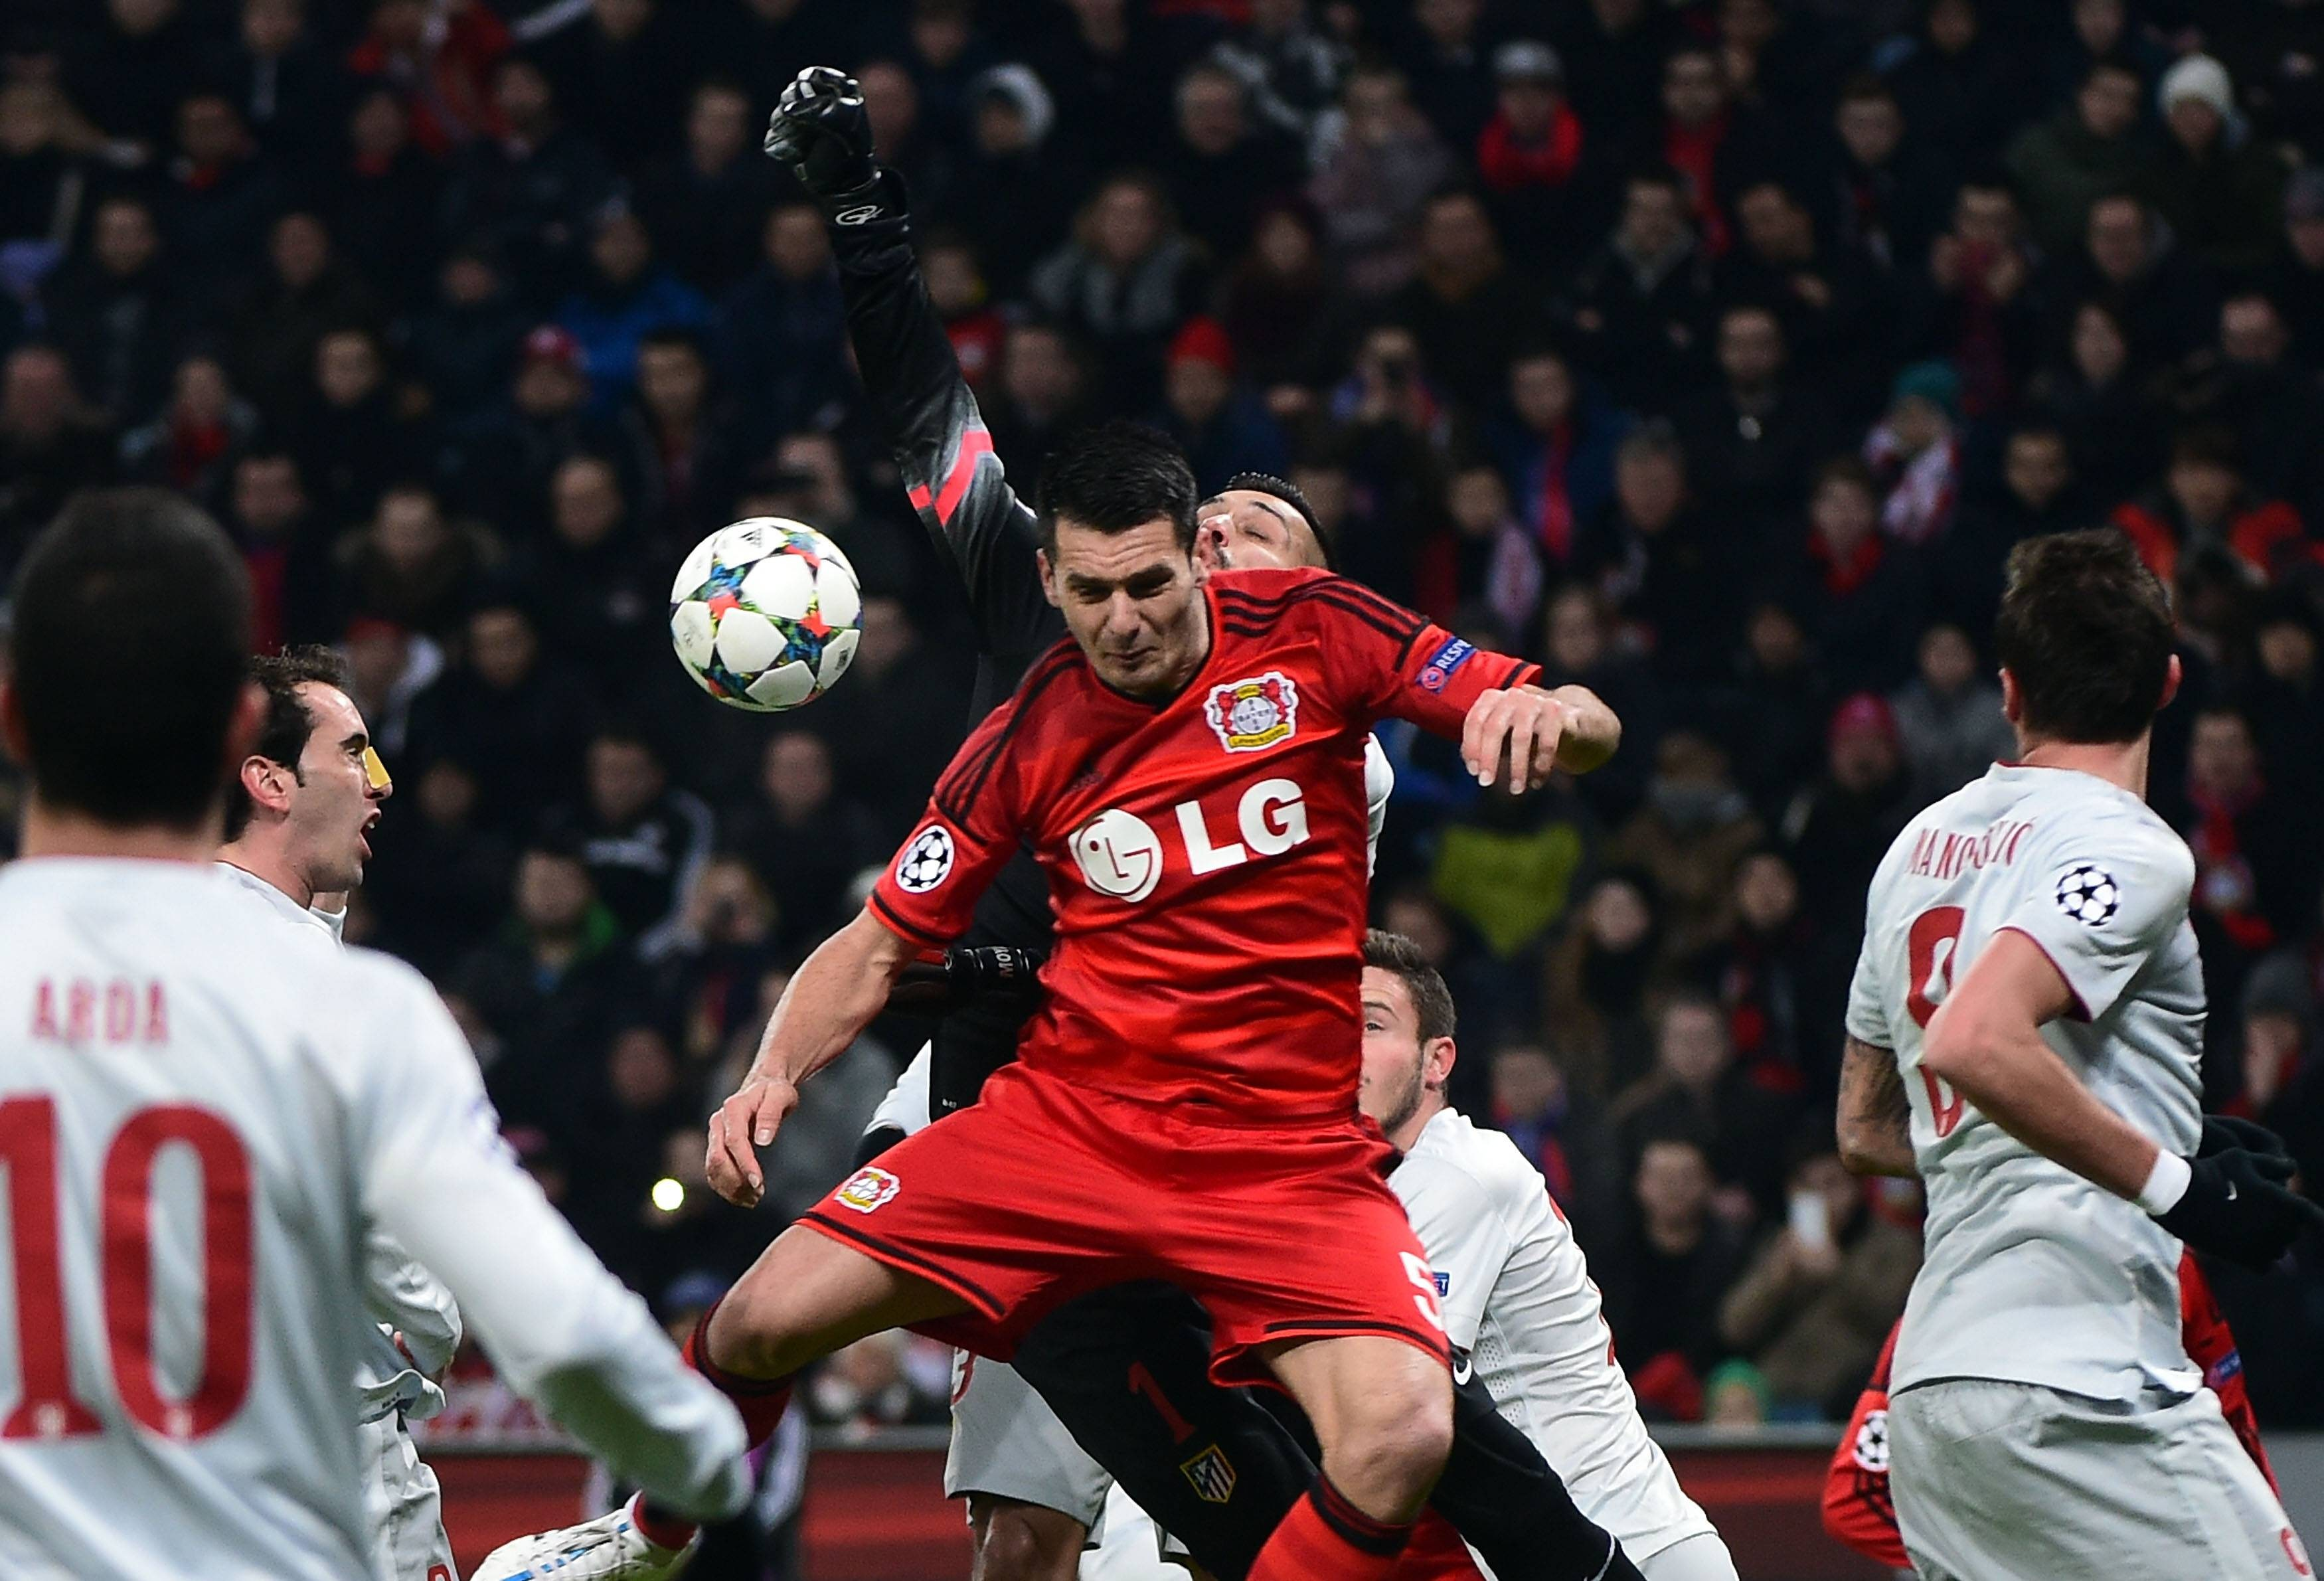 Bayer Leverkusen – Atlético Madrid